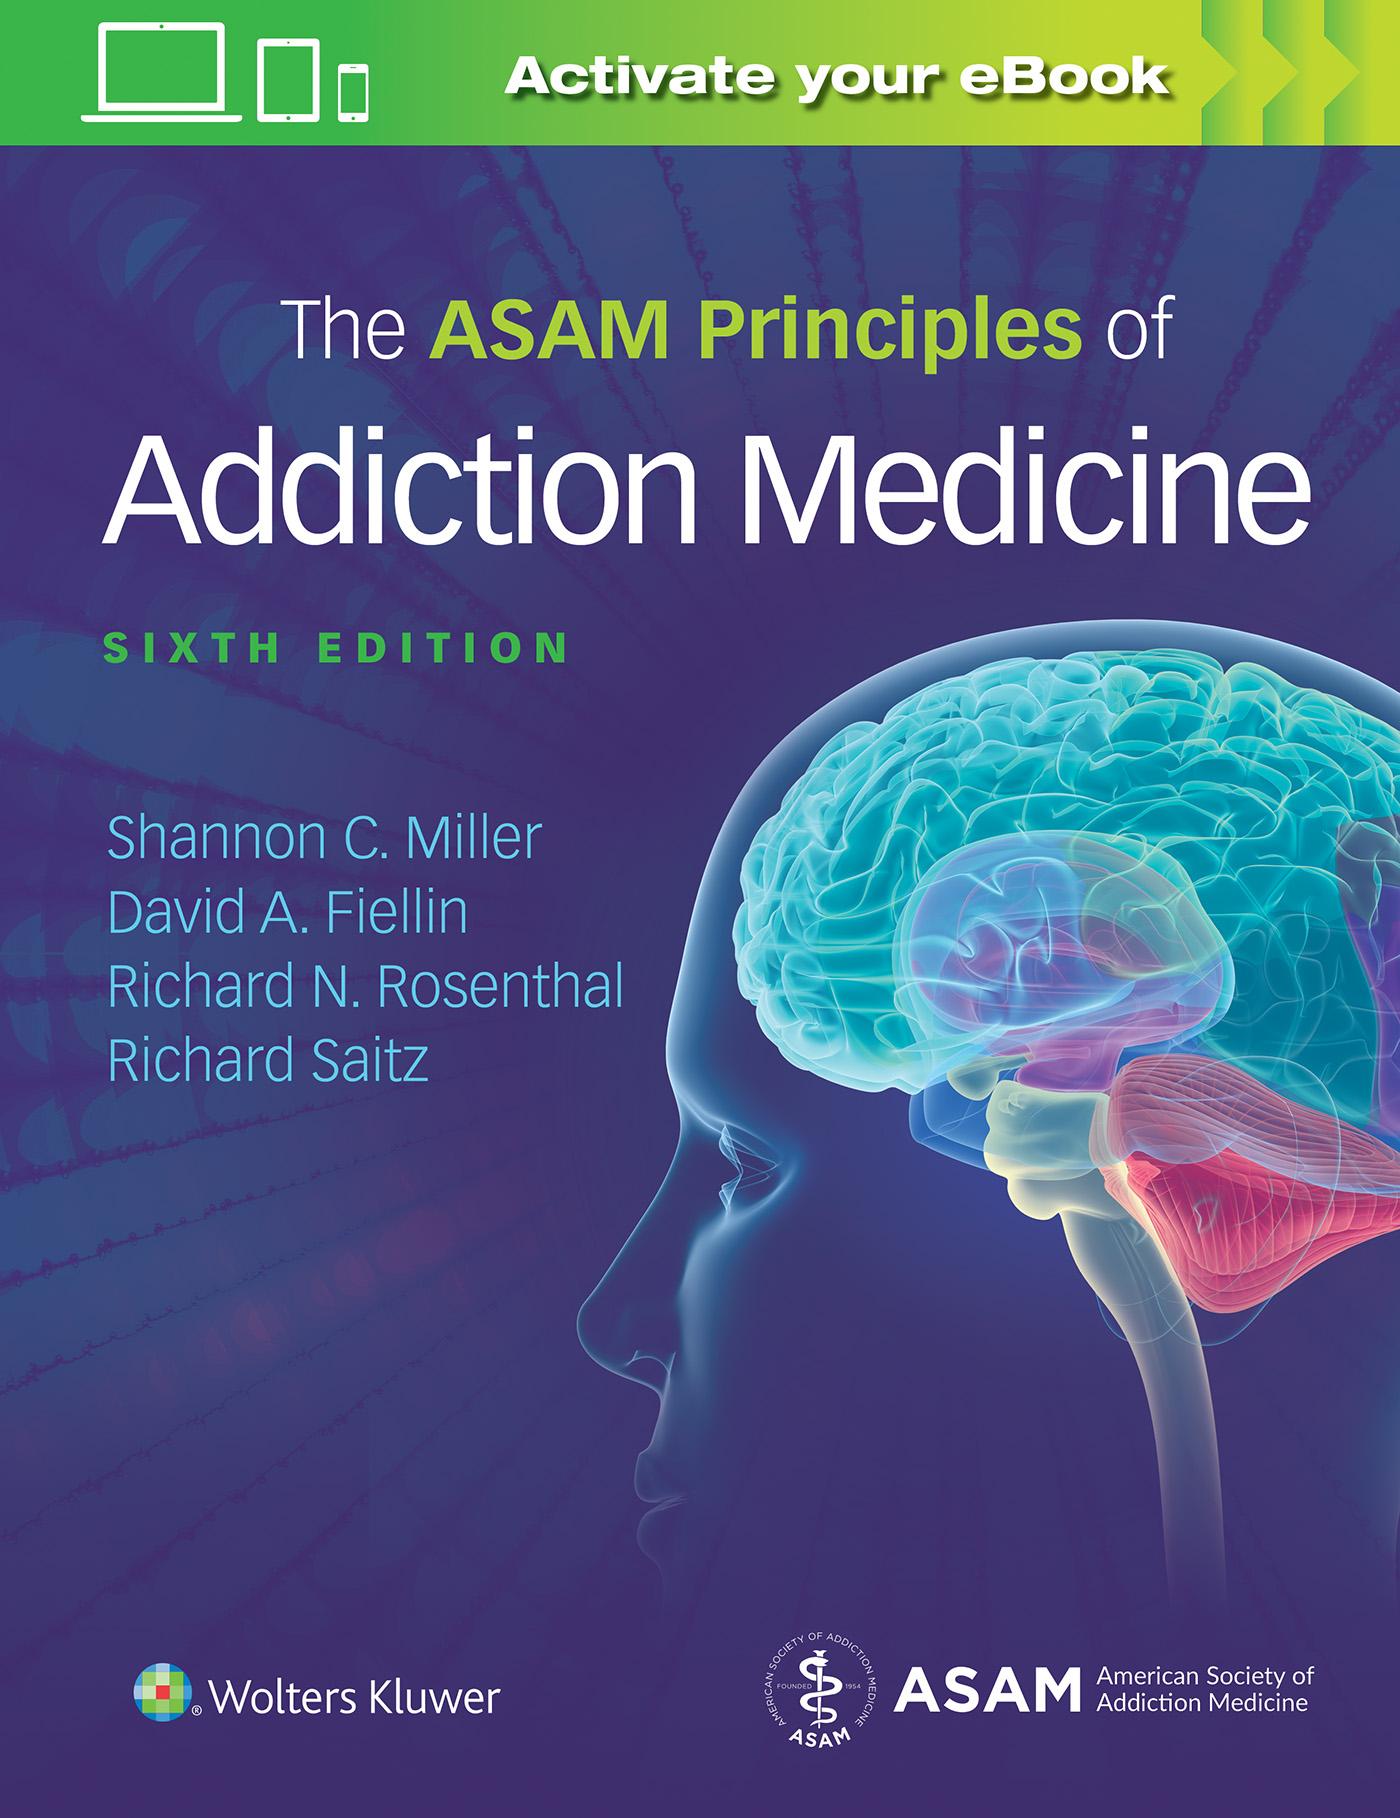 ASAM'S Principles of Addiction Medicine